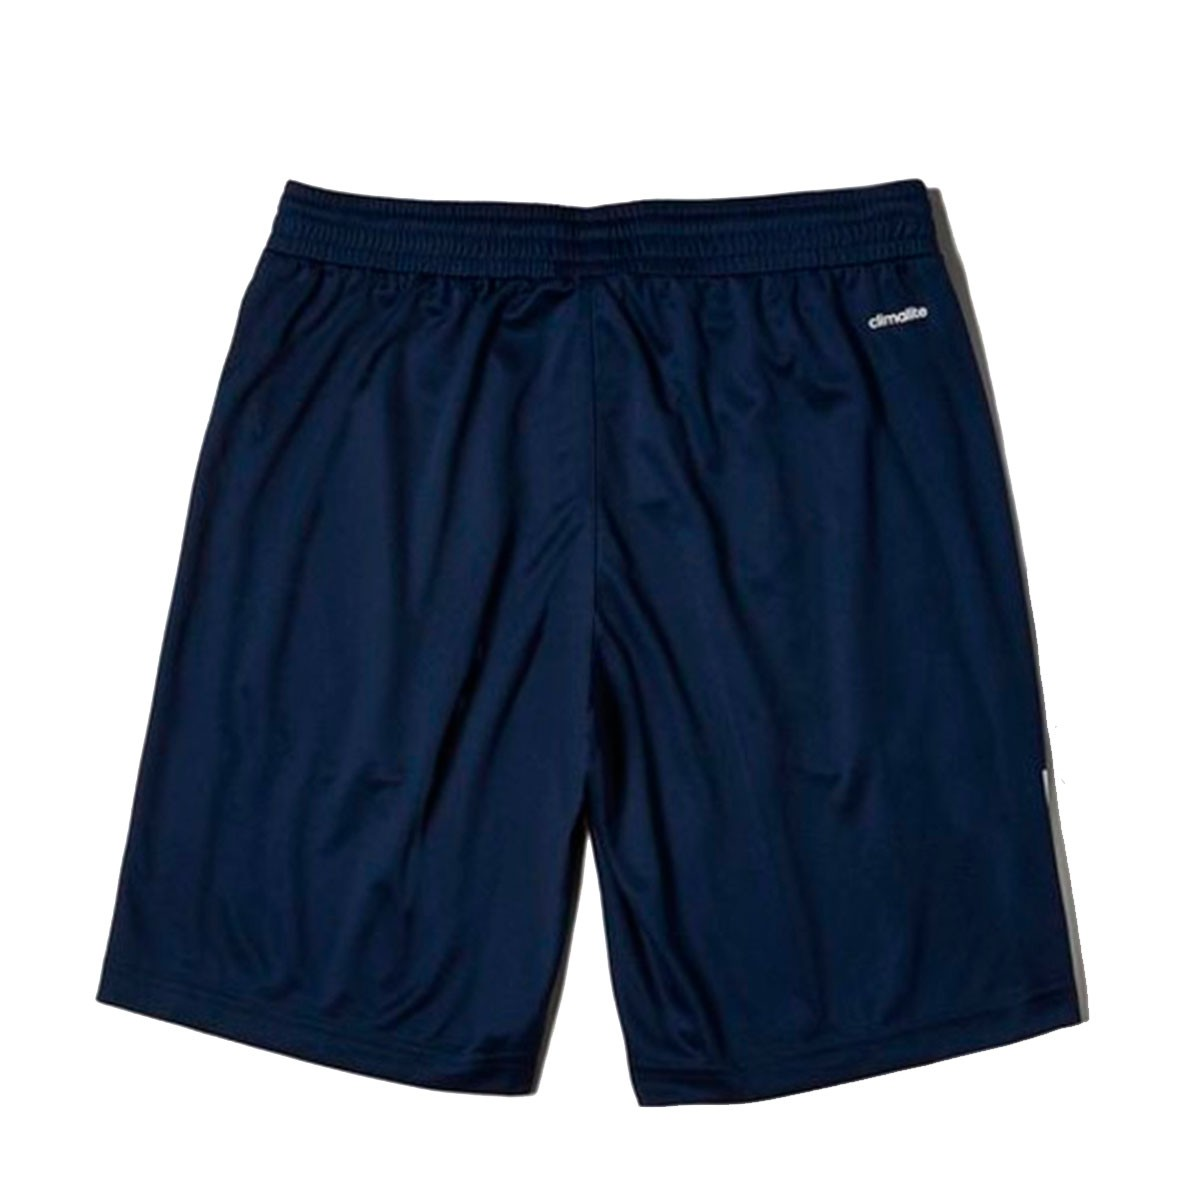 Short Adidas Galaxy Masculino Azul Marinho